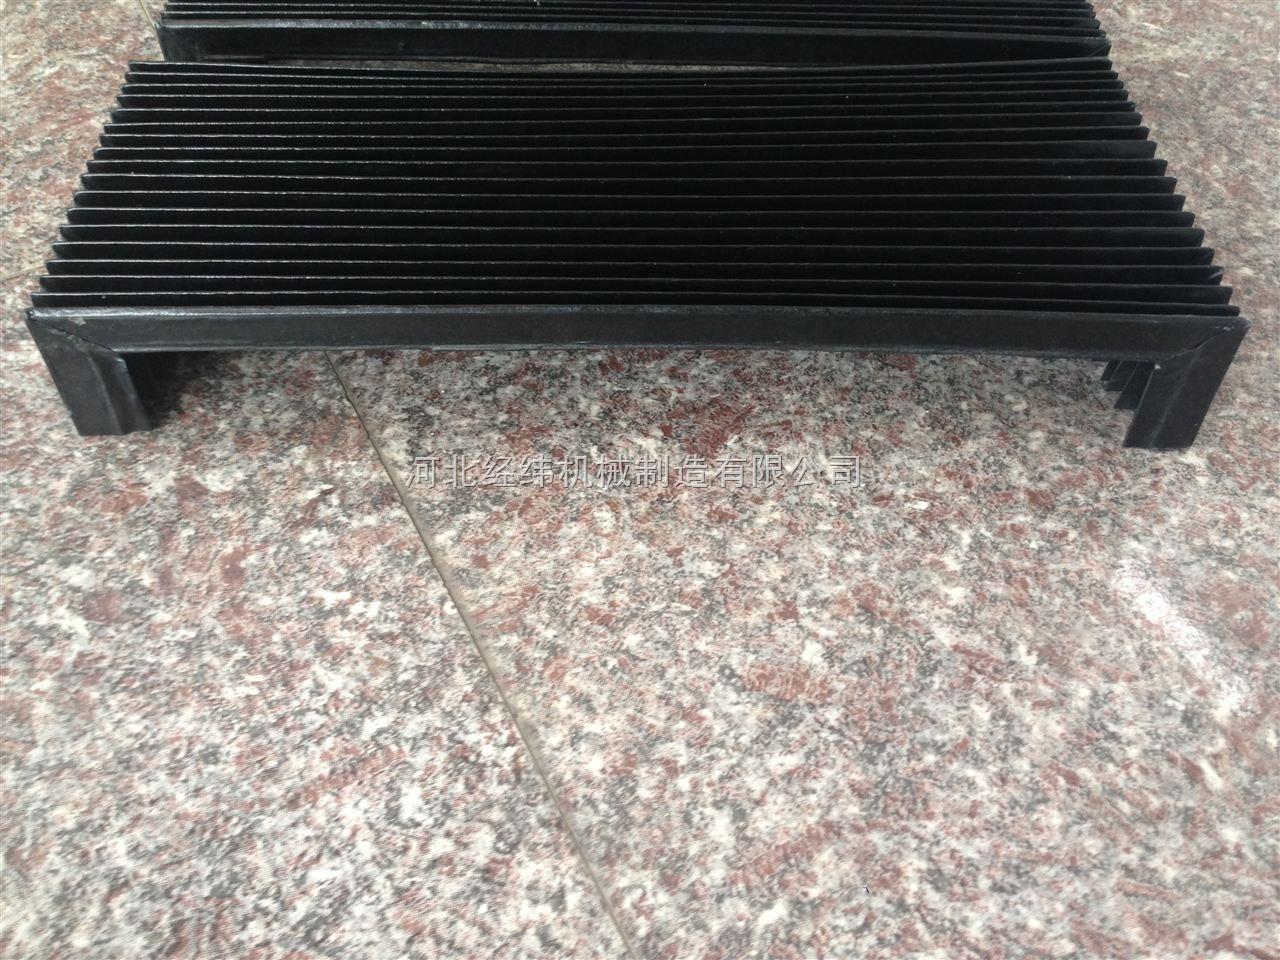 U型风琴防尘罩 PVC骨架支撑防护罩 经纬专业生产